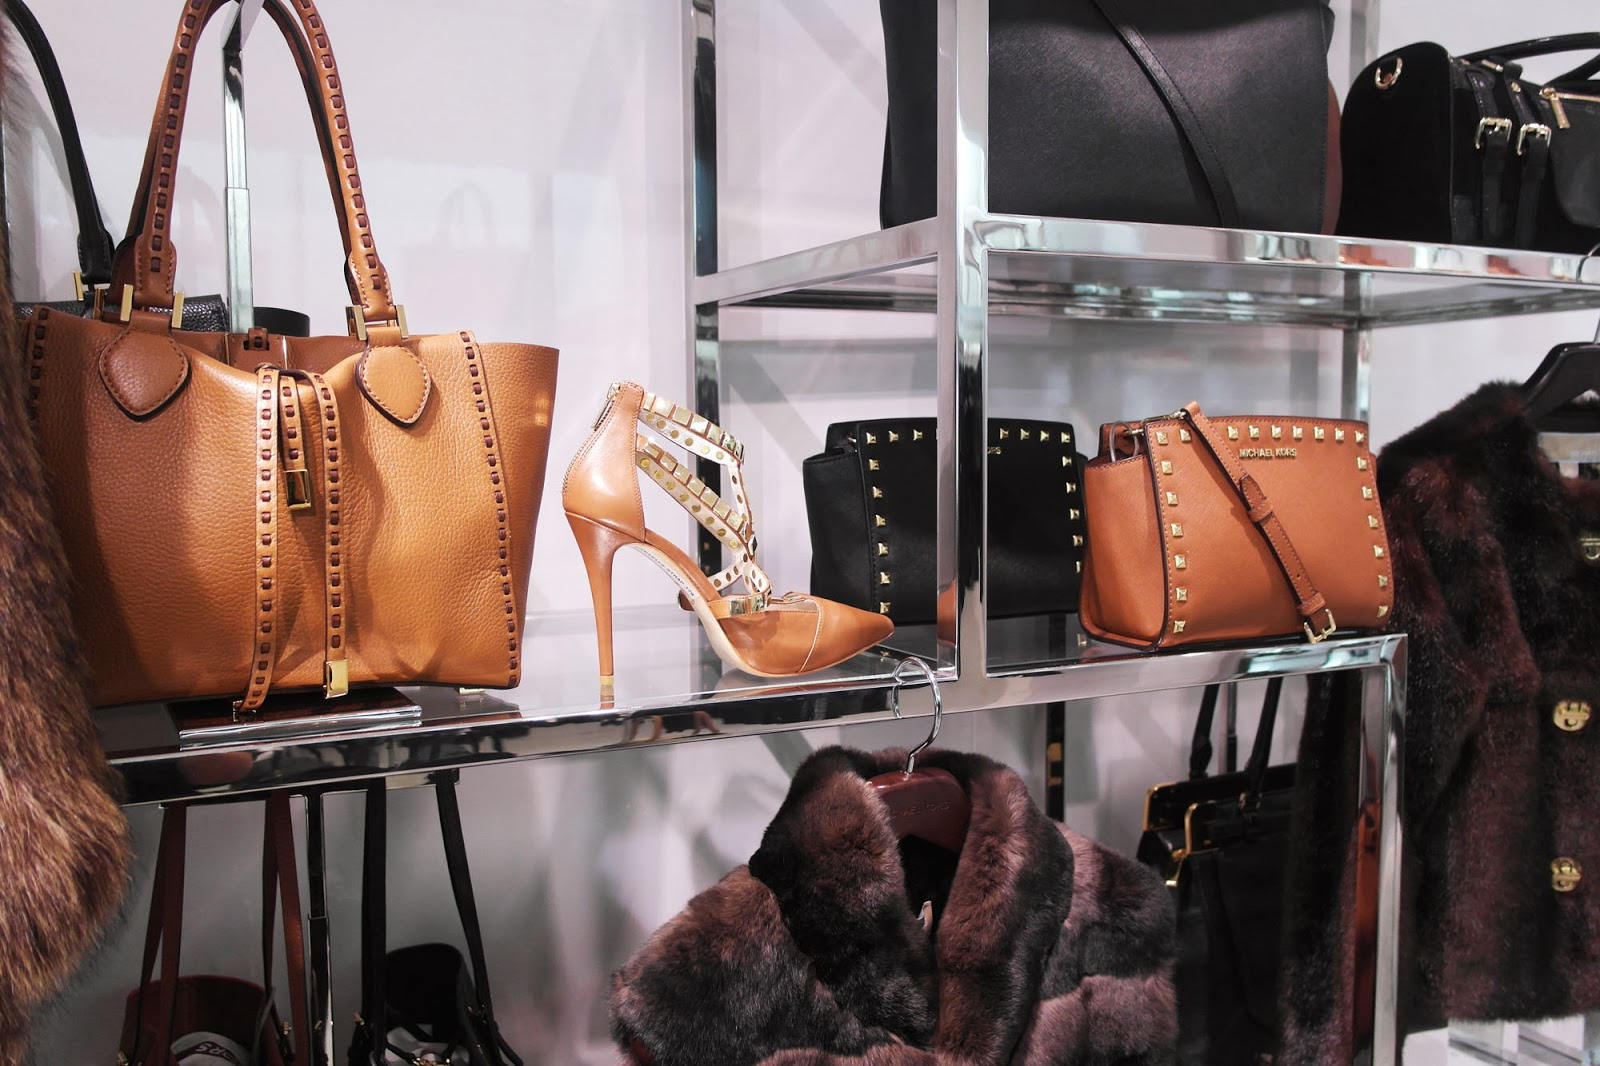 michael kors handbags yorkdale blog rh labpackservices com